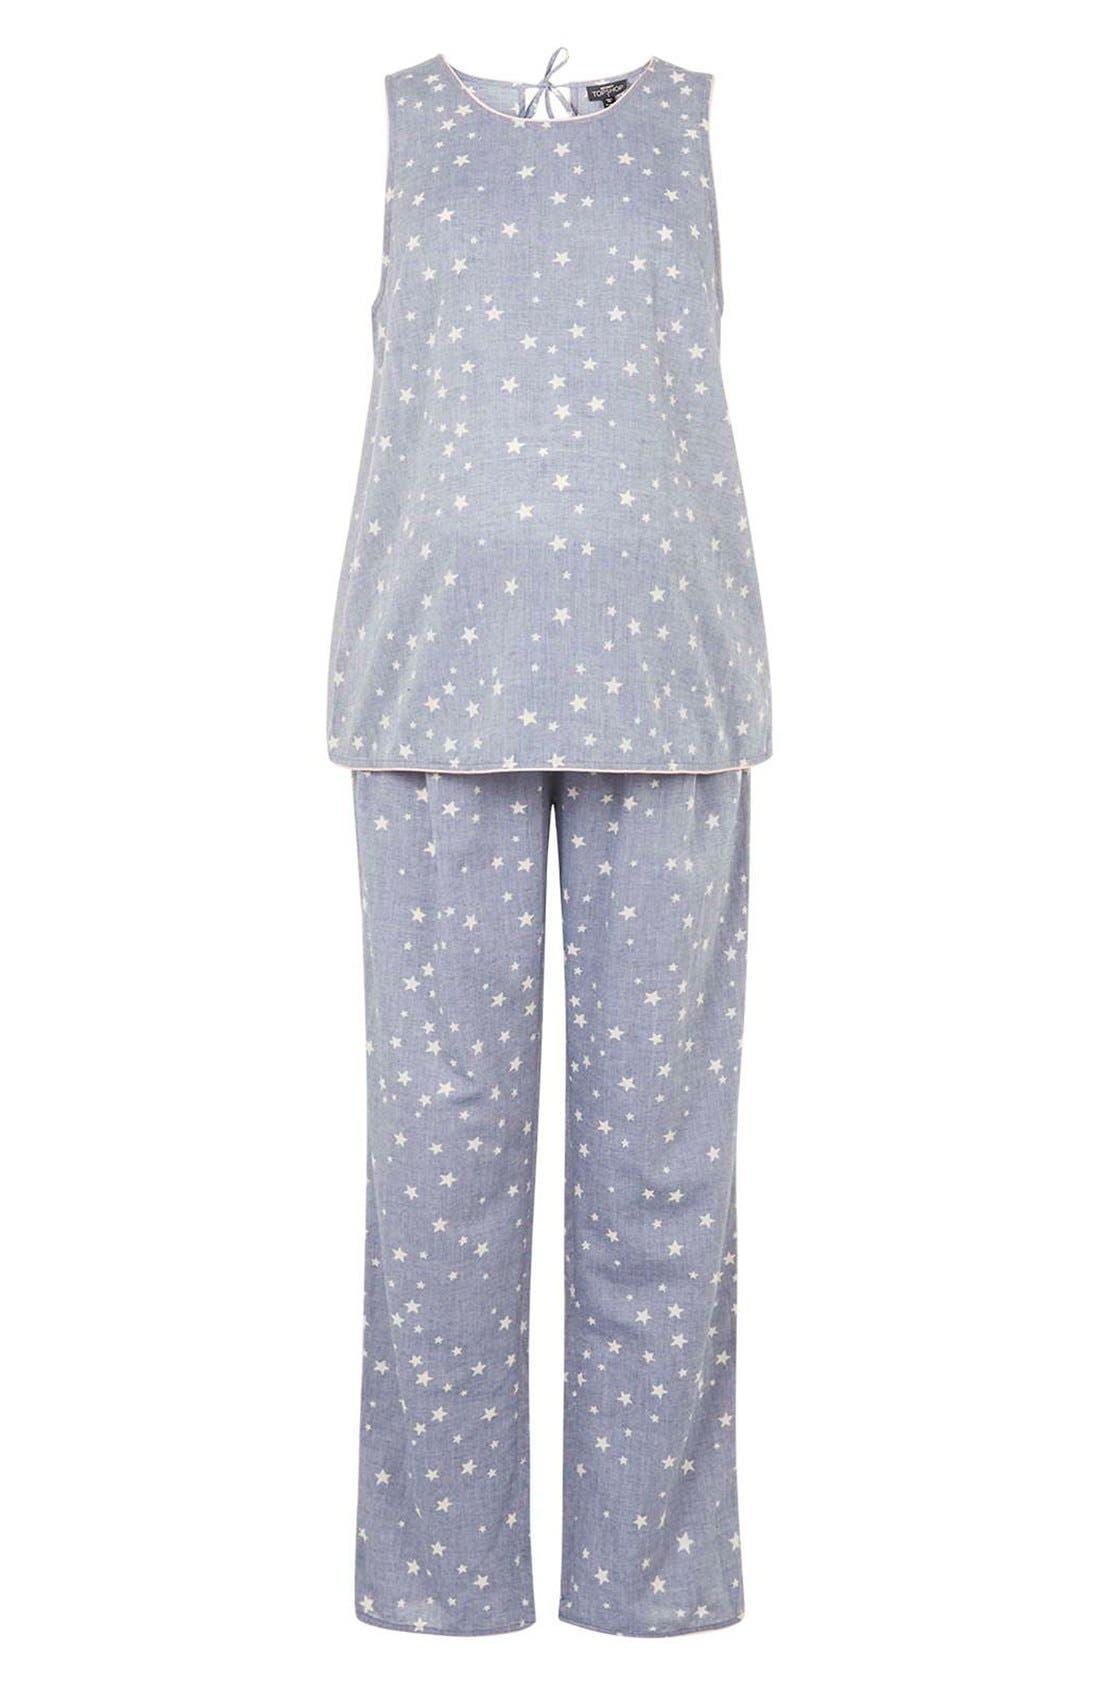 Main Image - Topshop'Mischa' Star Print MaternityPajamas